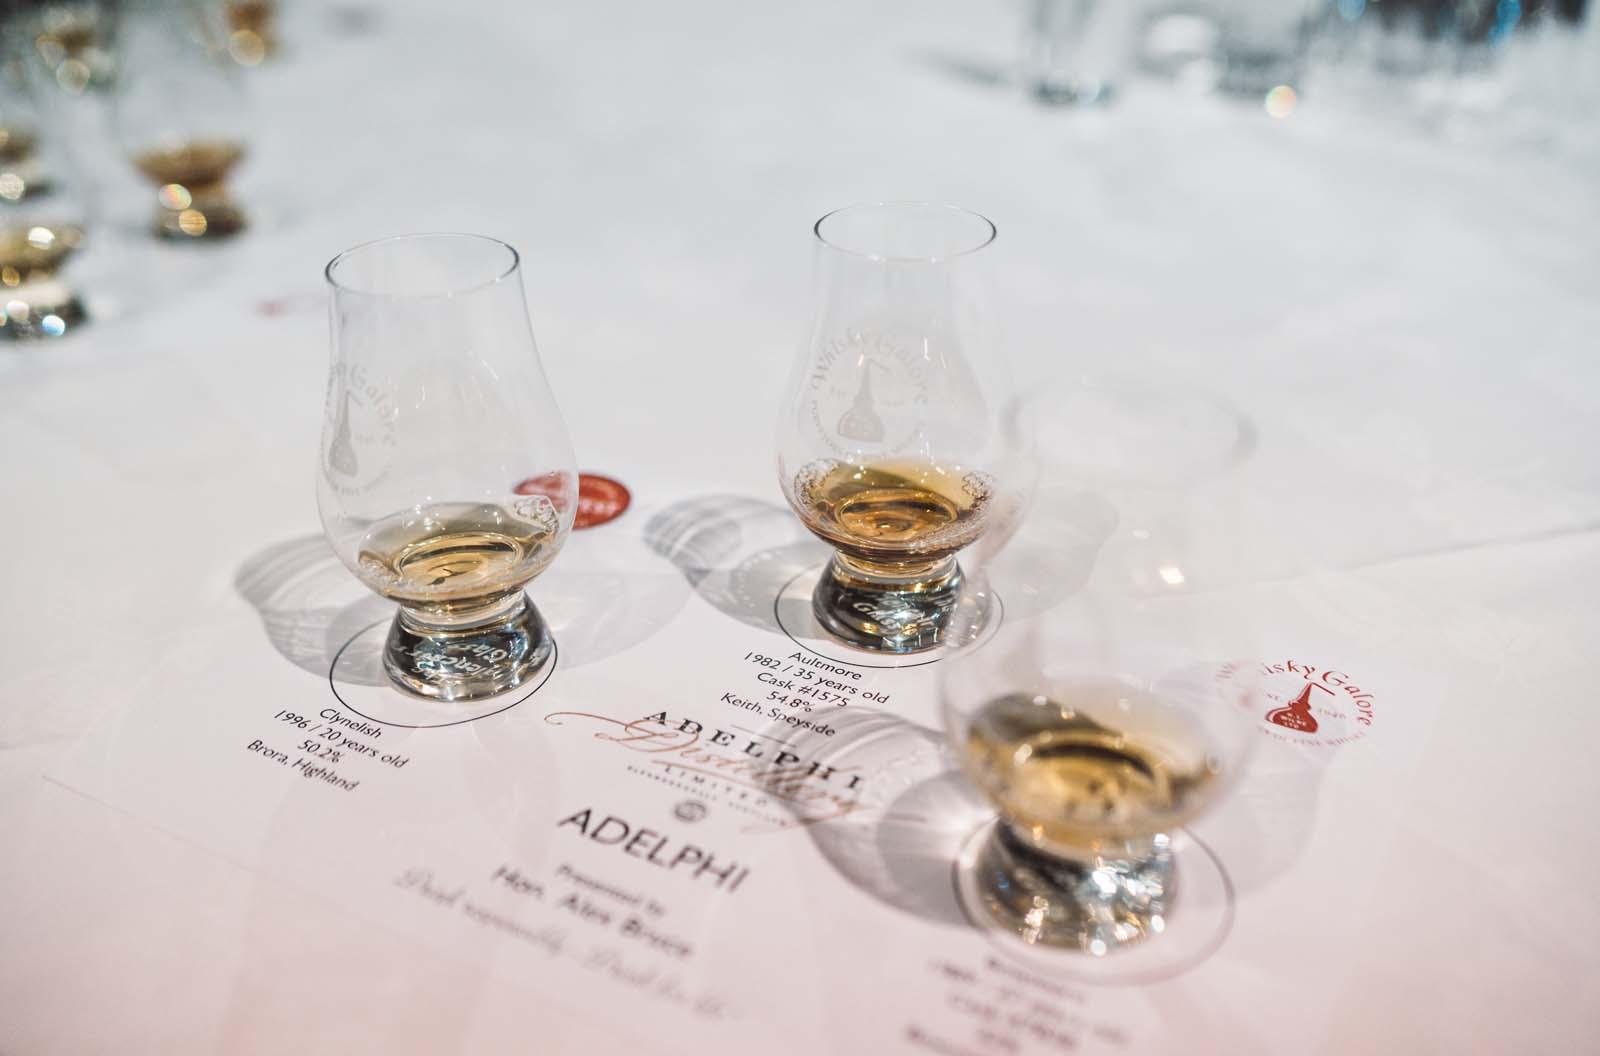 Dramfest 2018 for Whisky Galore-355.jpg